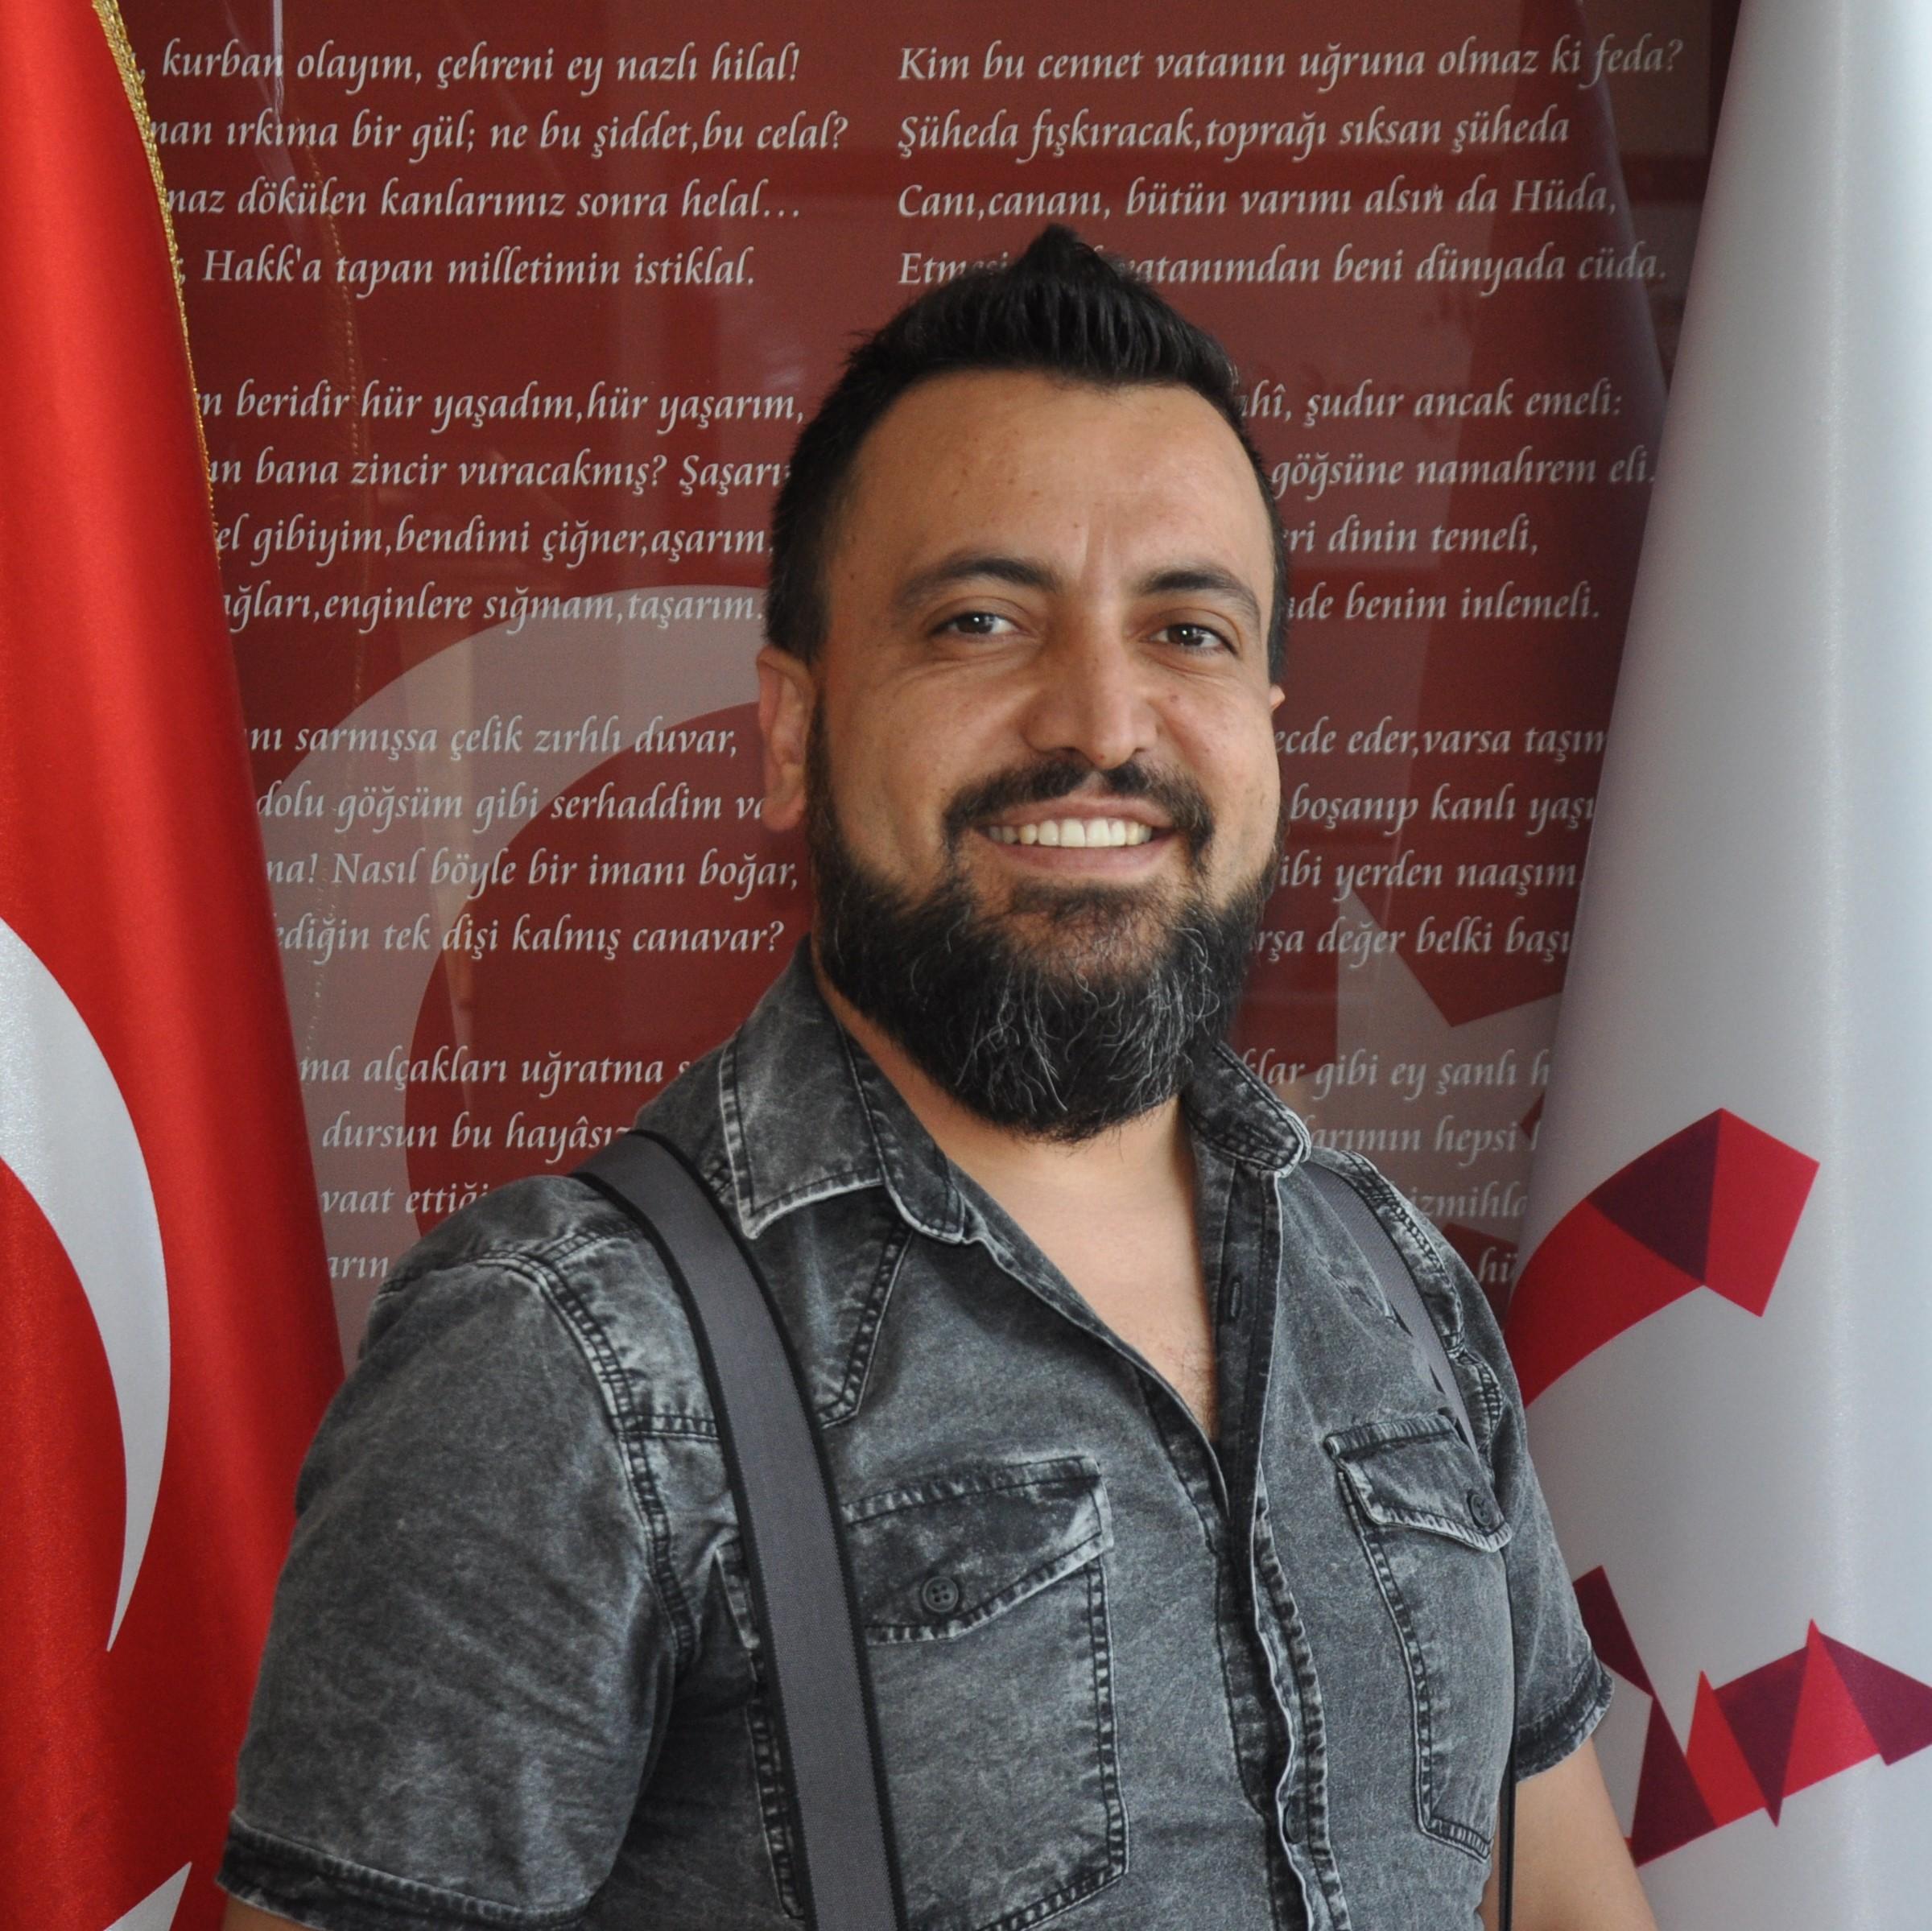 Serdal Ercan